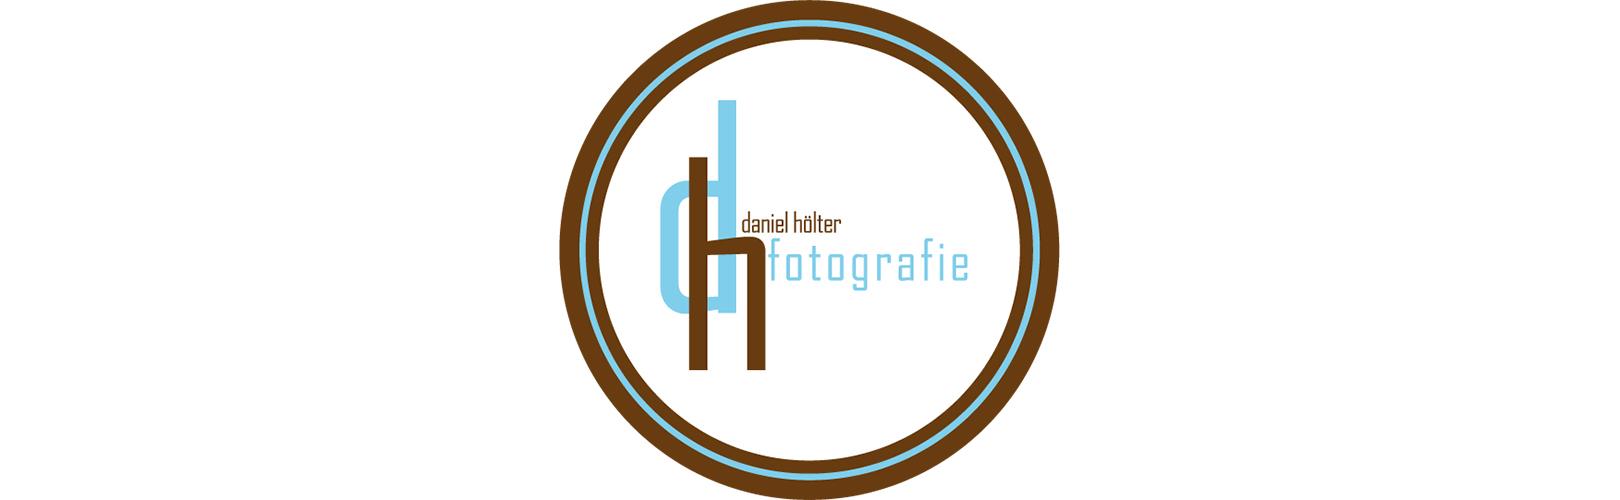 DanielHölterFotografie3